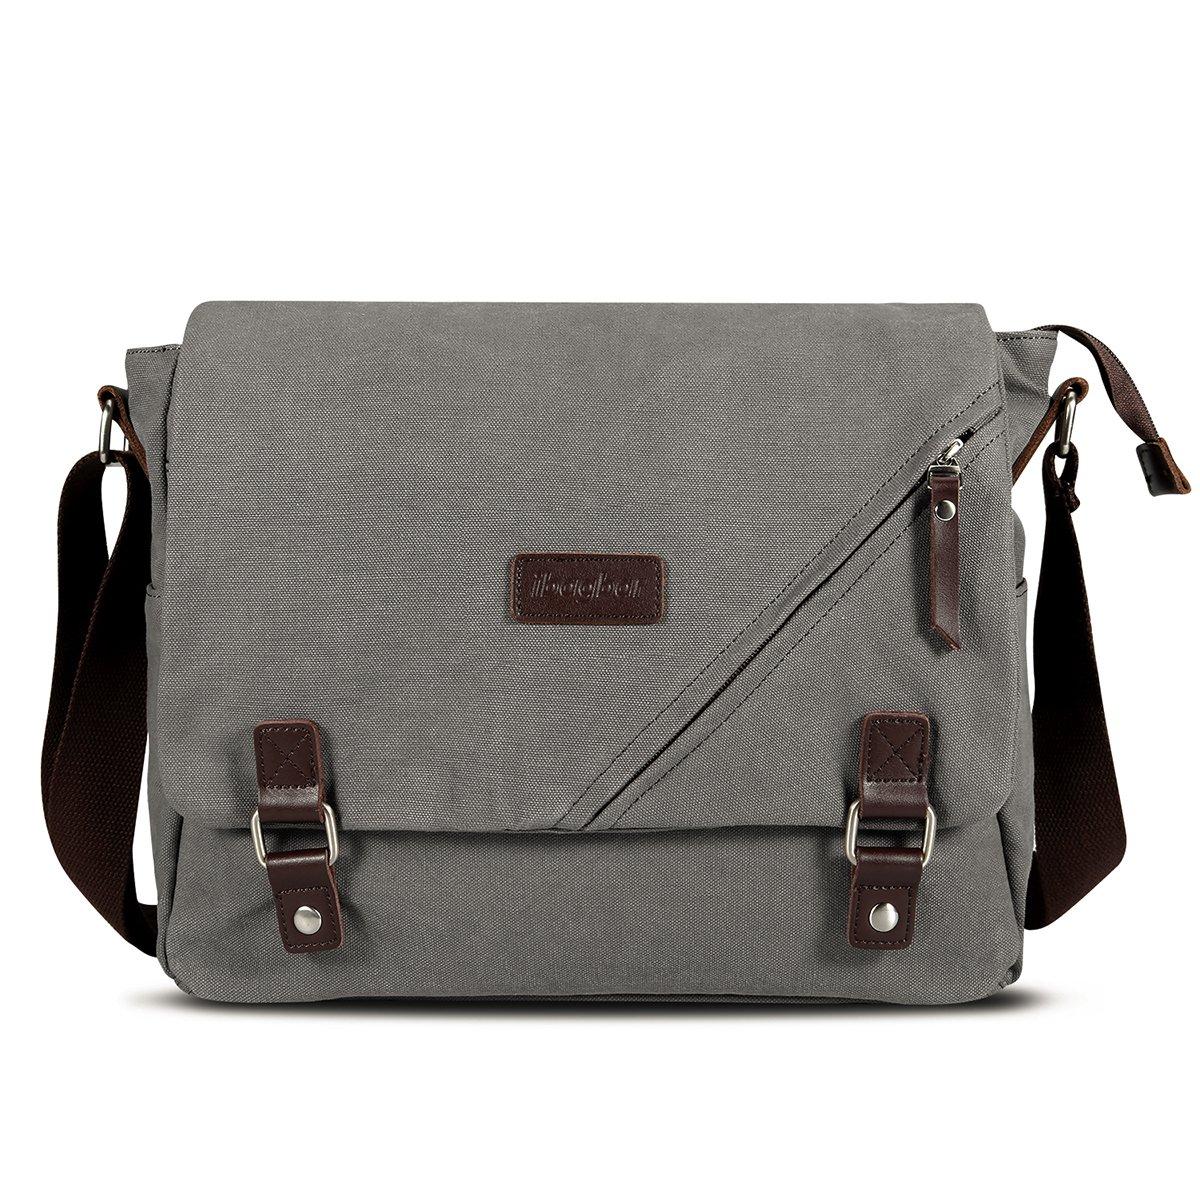 22c6e426f0 Amazon.com  ibagbar Canvas Messenger Bag Shoulder Bag Laptop Bag Computer Bag  Satchel Bag Bookbag School Bag Working Bag for Men and Women Gray Large  ...